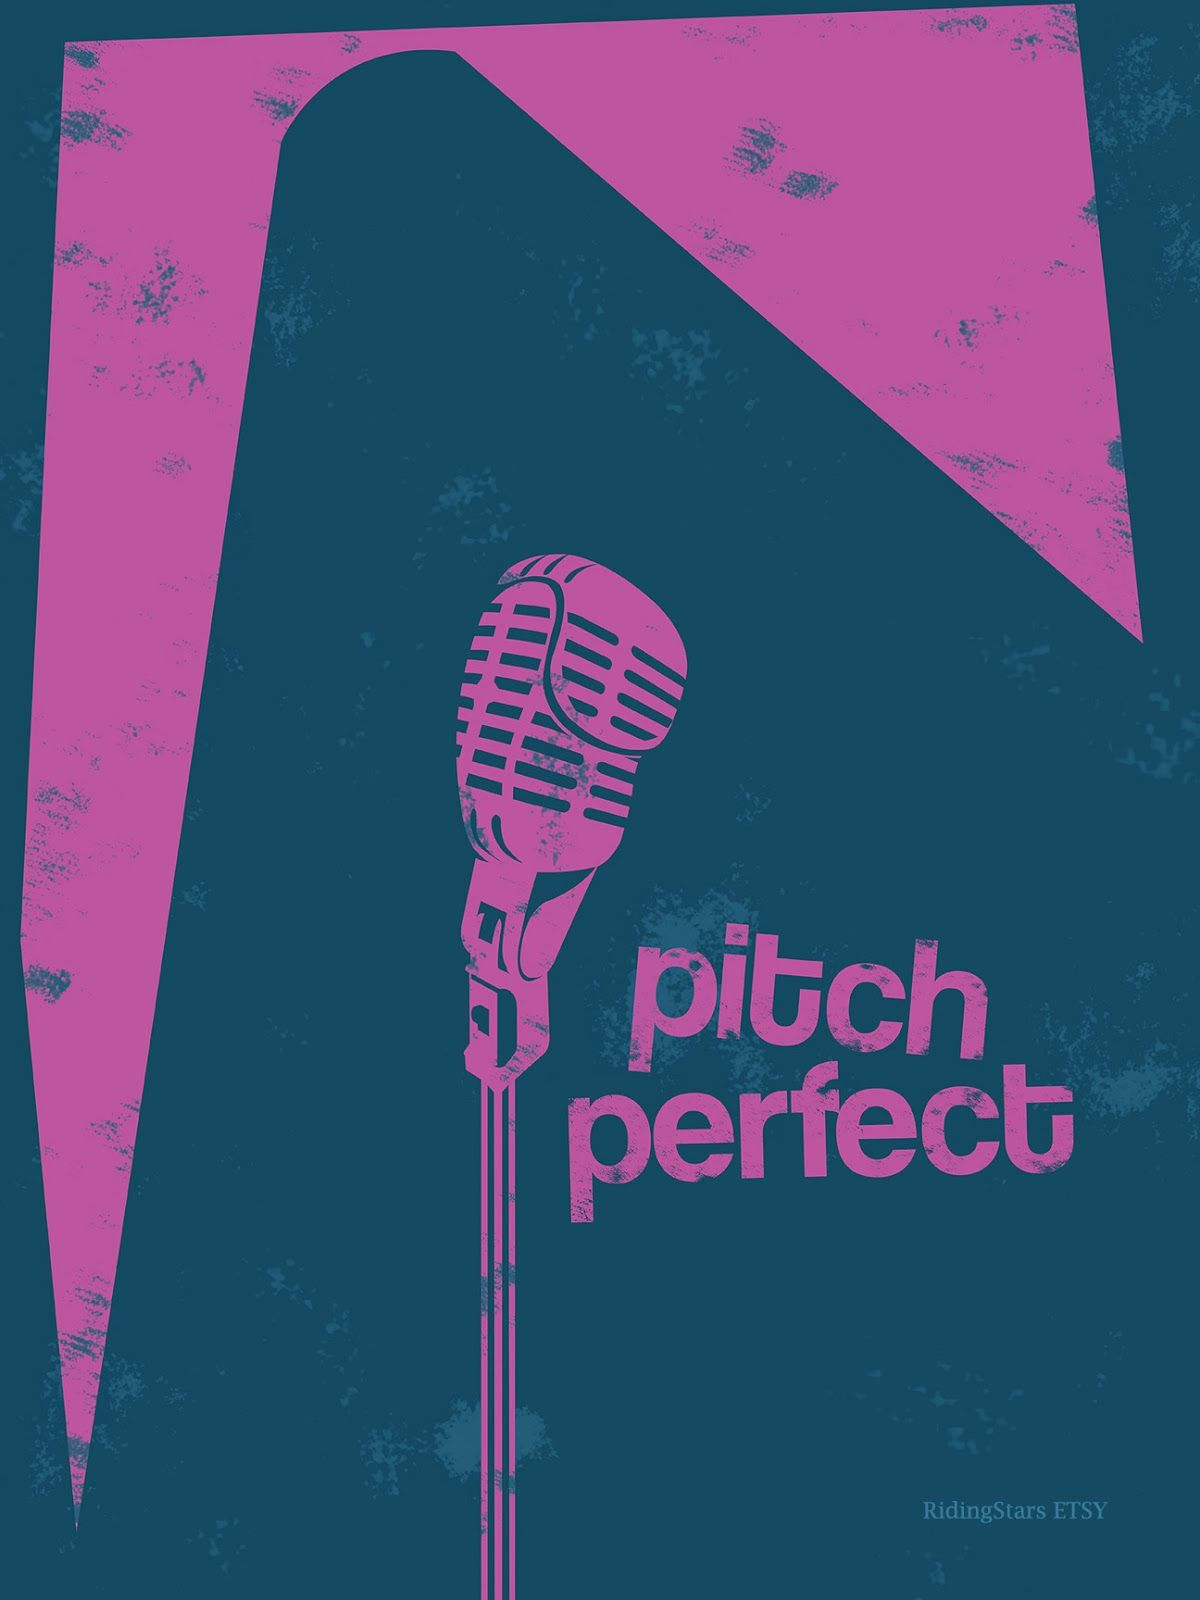 Pitch Perfect (2012) ~ Minimal Movie Poster   Film posters ...   Pitch Perfect 2012 Movie Poster